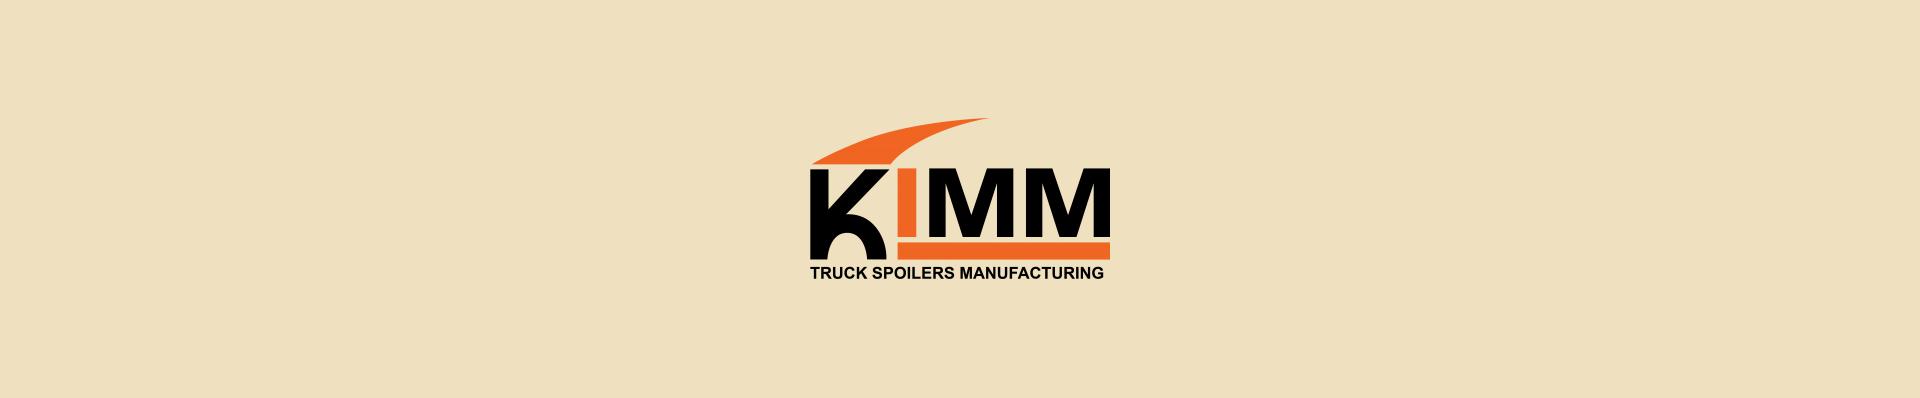 kimm truck spoilers manufacturing